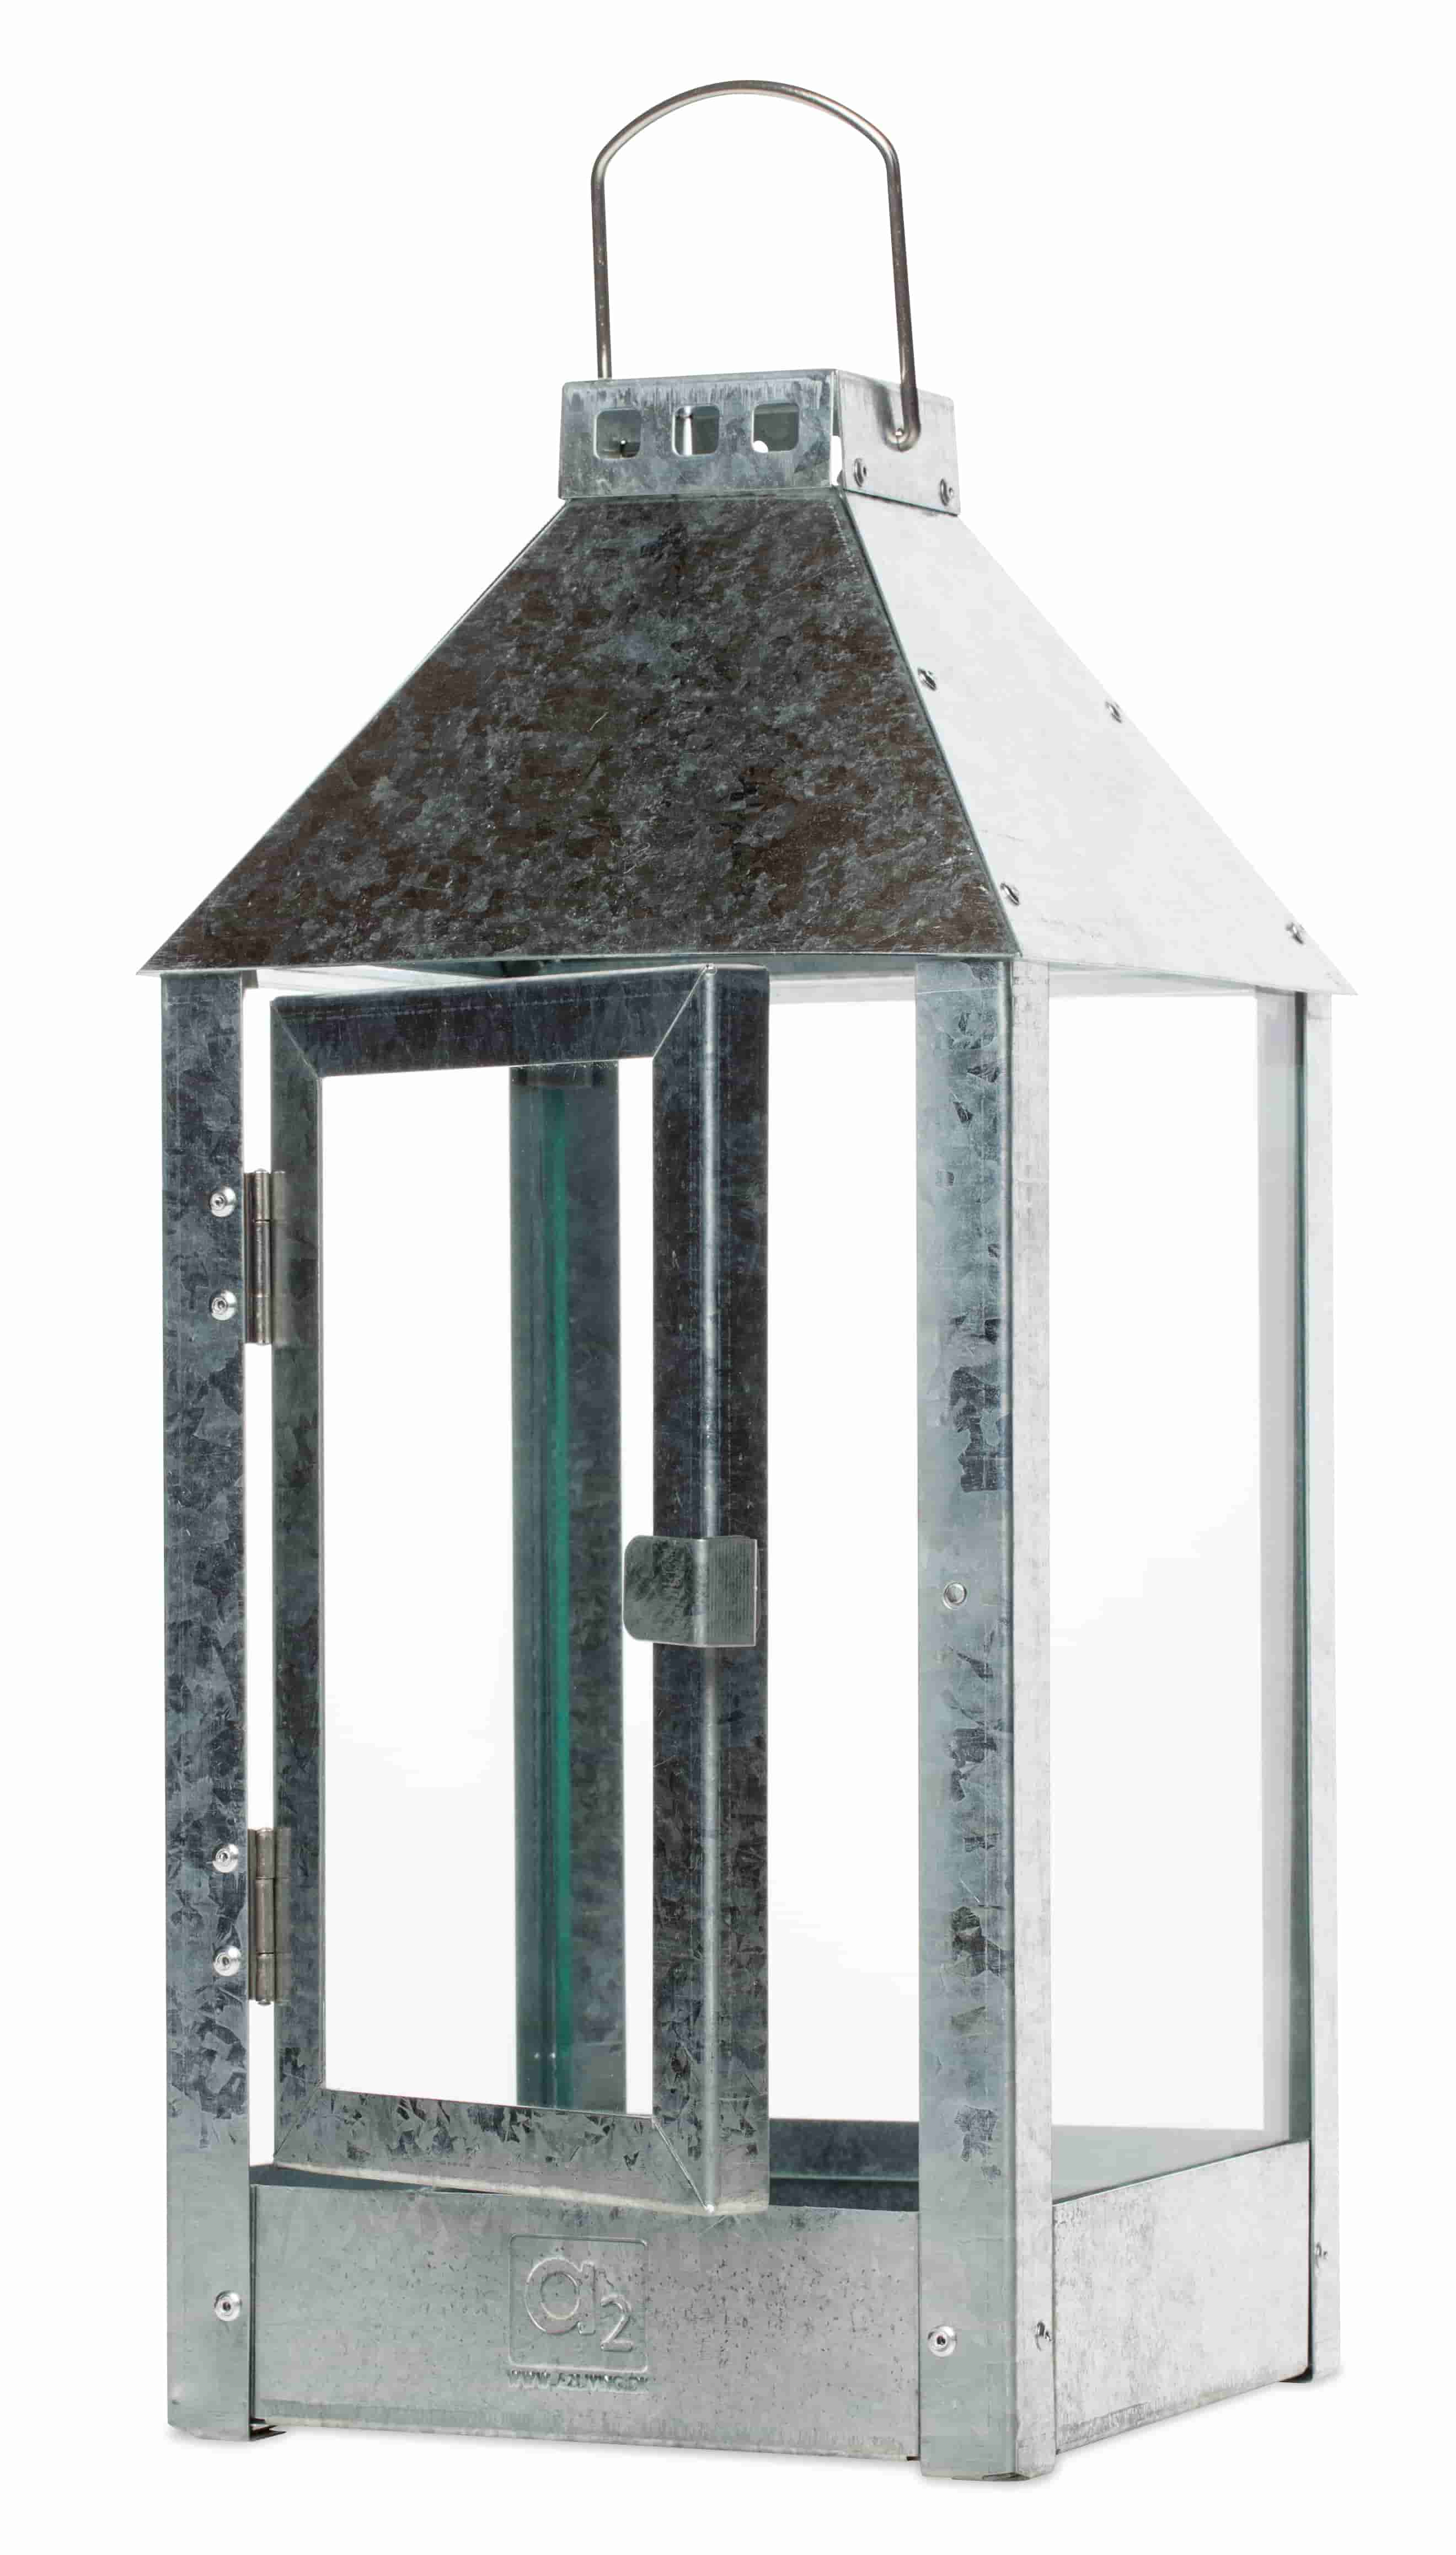 a2 living A2 living midi lanterne - rustfri stål (19x42,5) fra boboonline.dk